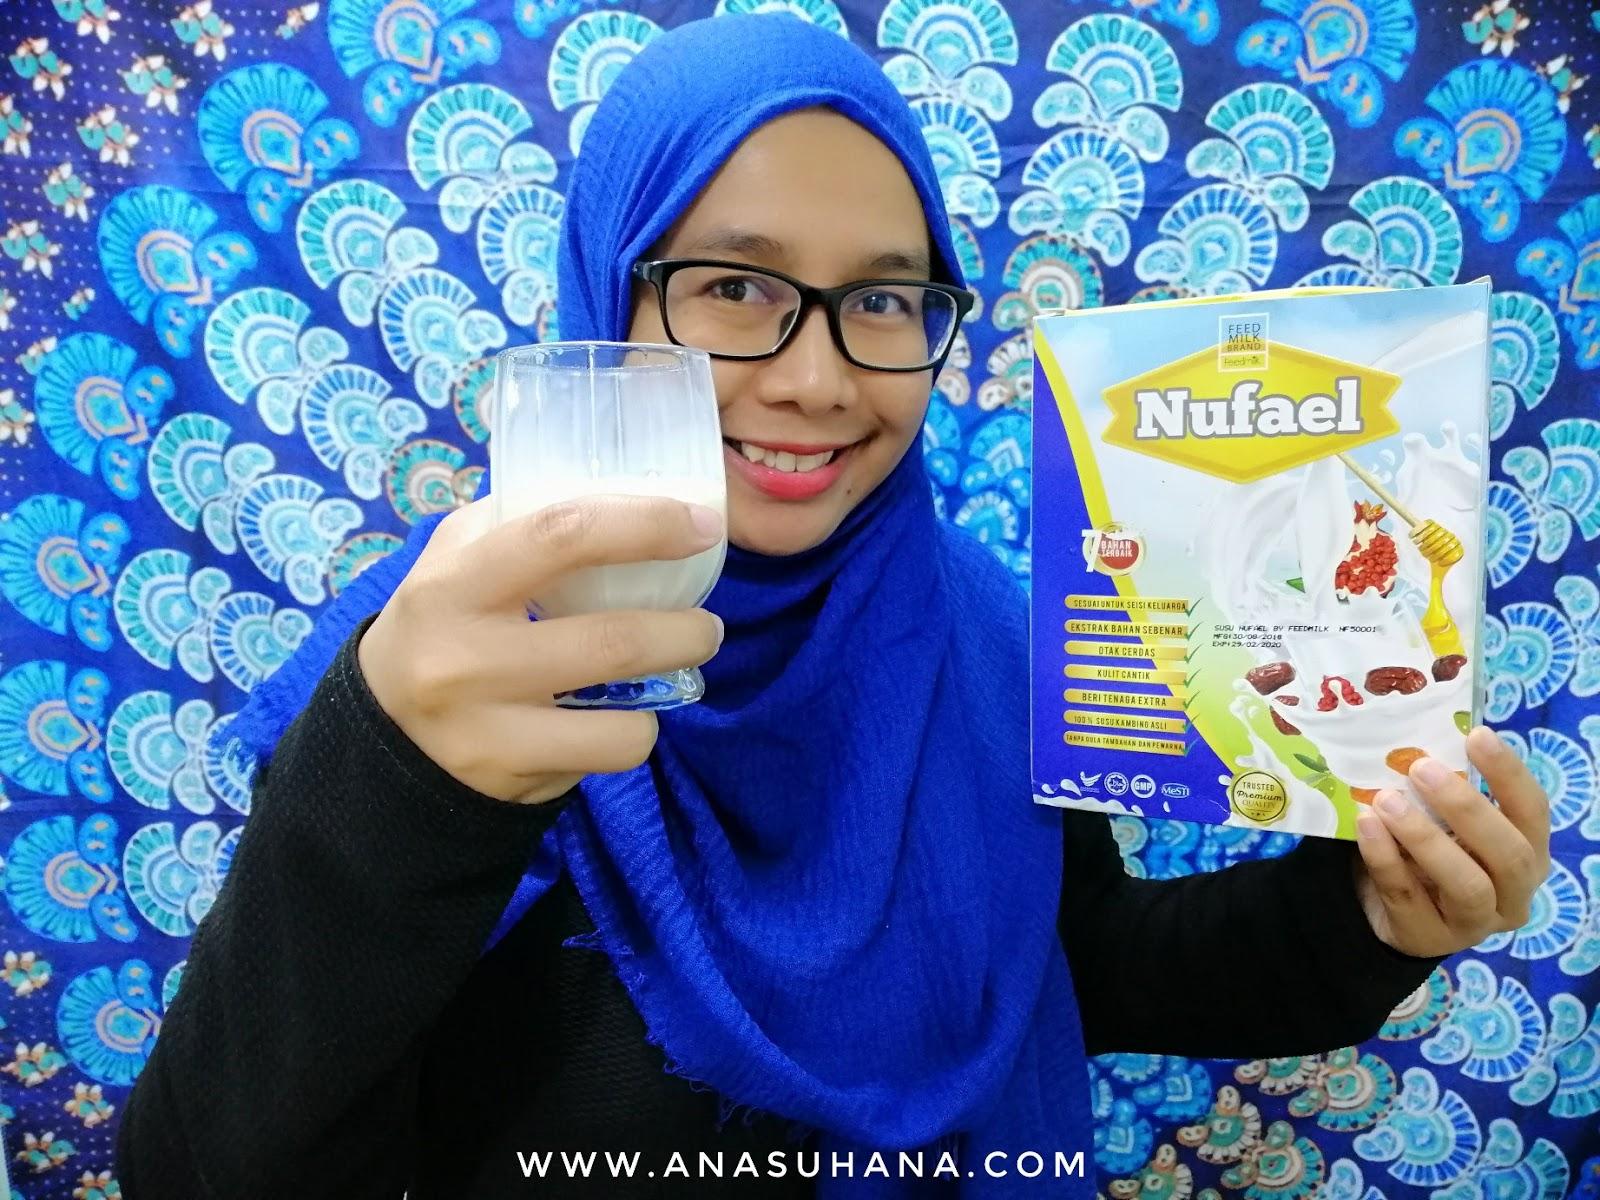 Susu Nufael - Susu Kambing Dengan Bahan Semulajadi